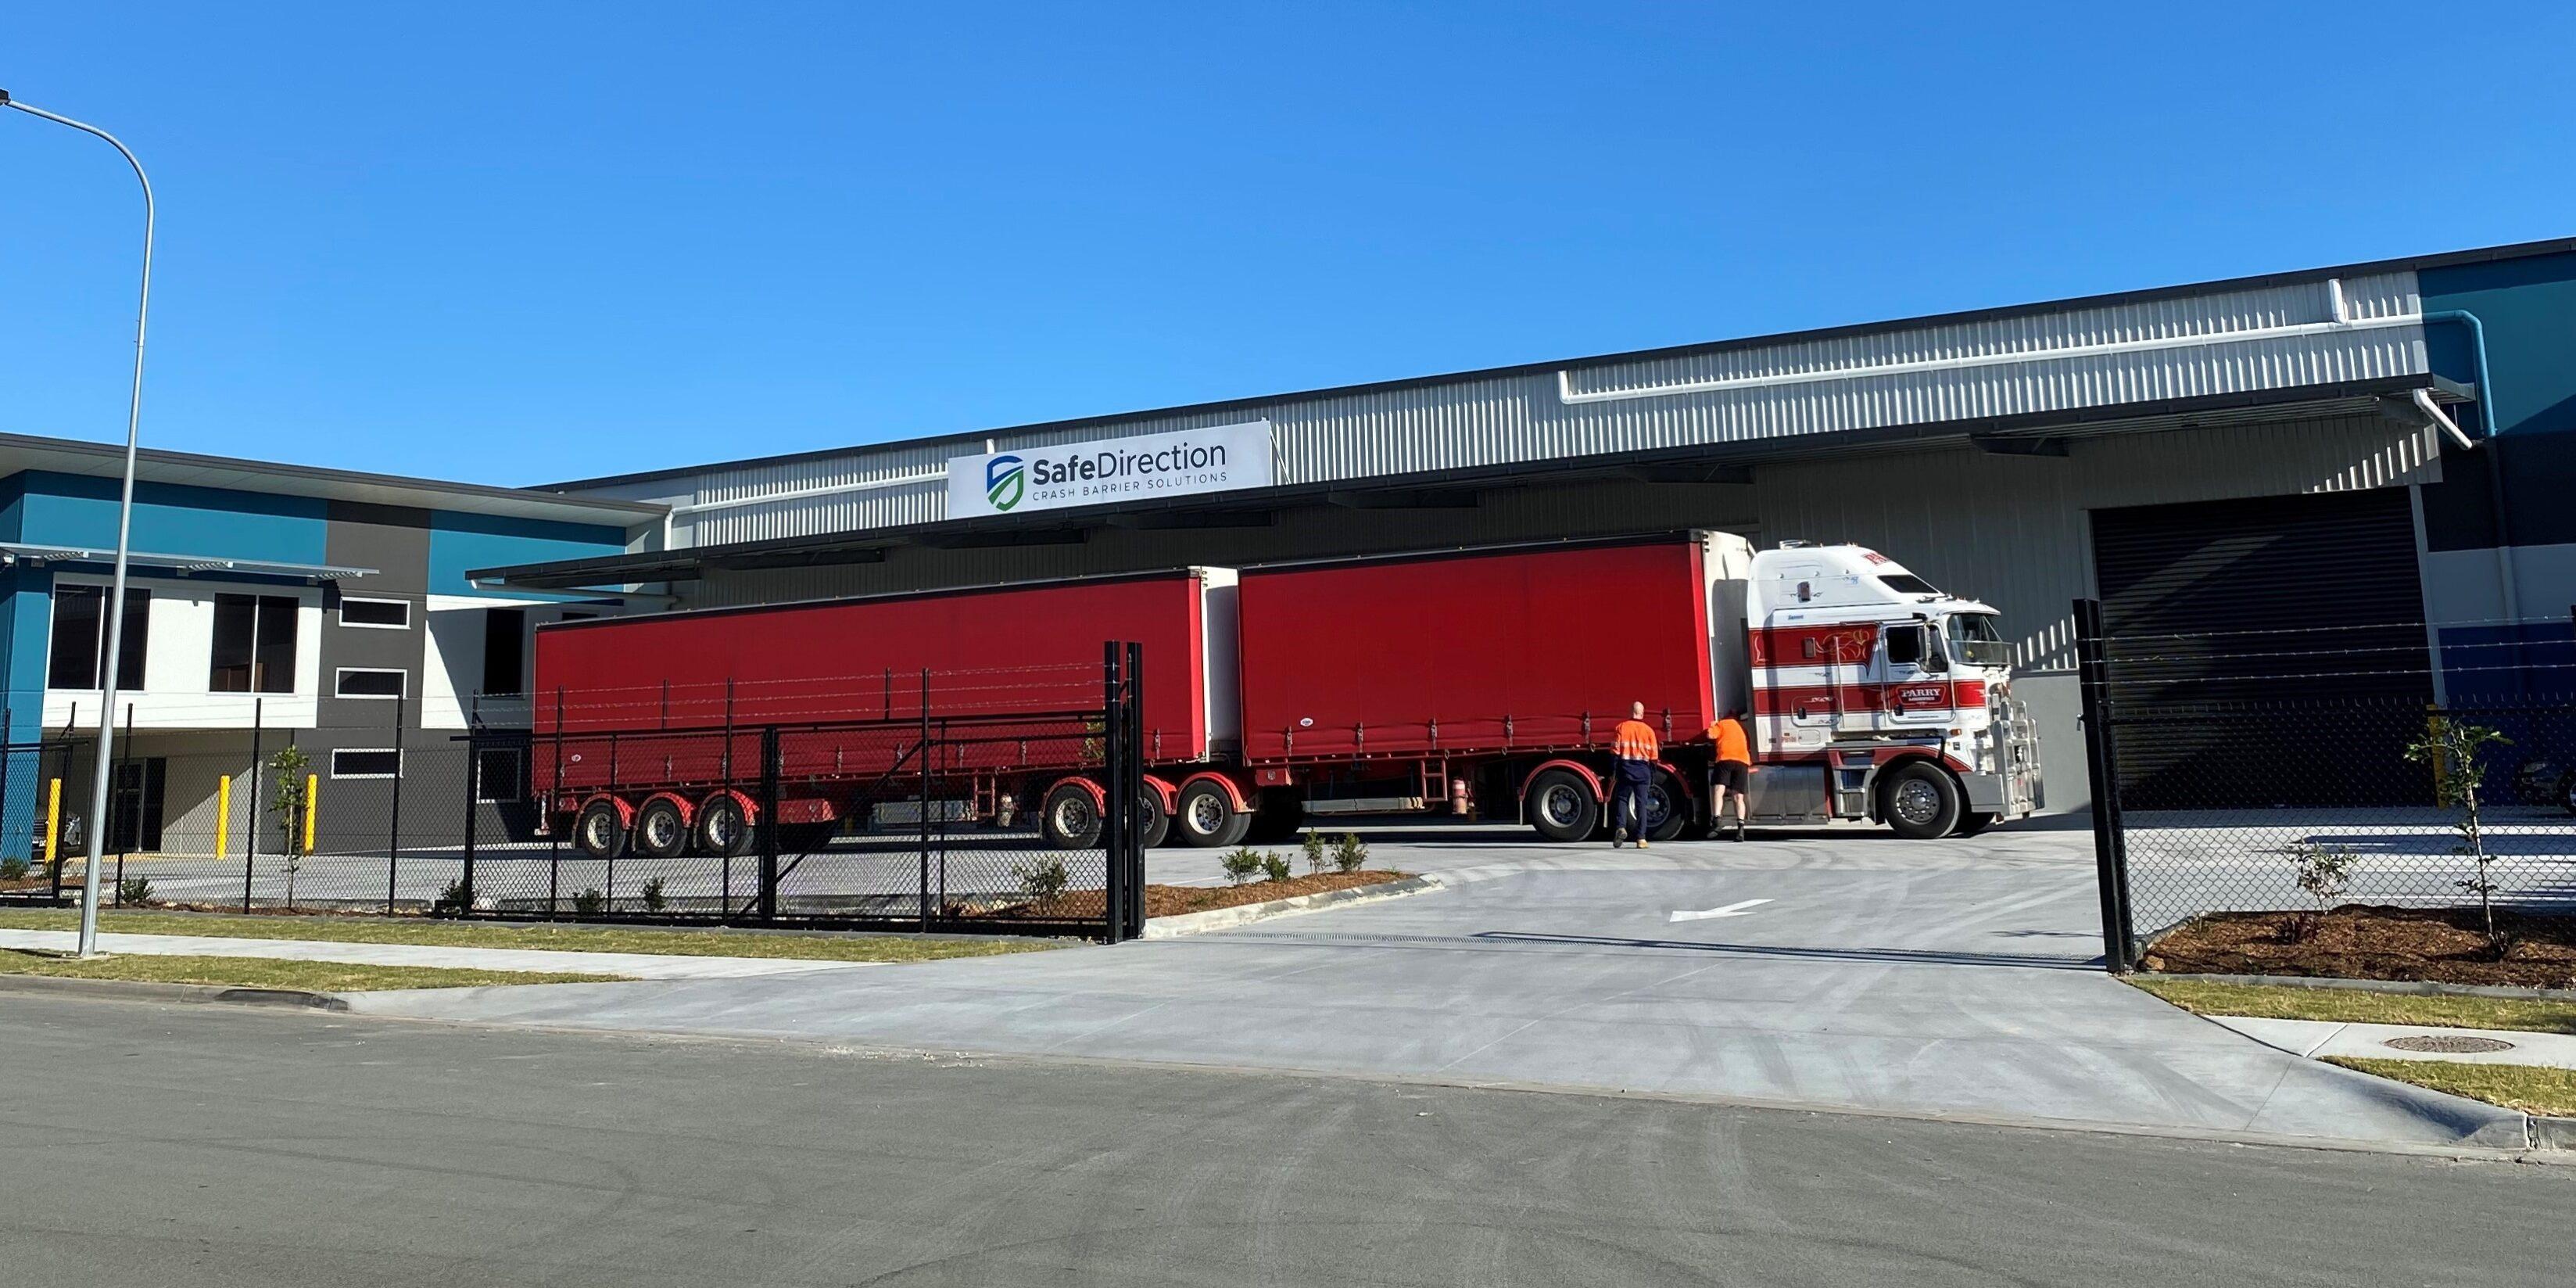 Safe Direction facility in Yatala, Brisbane, Queensland